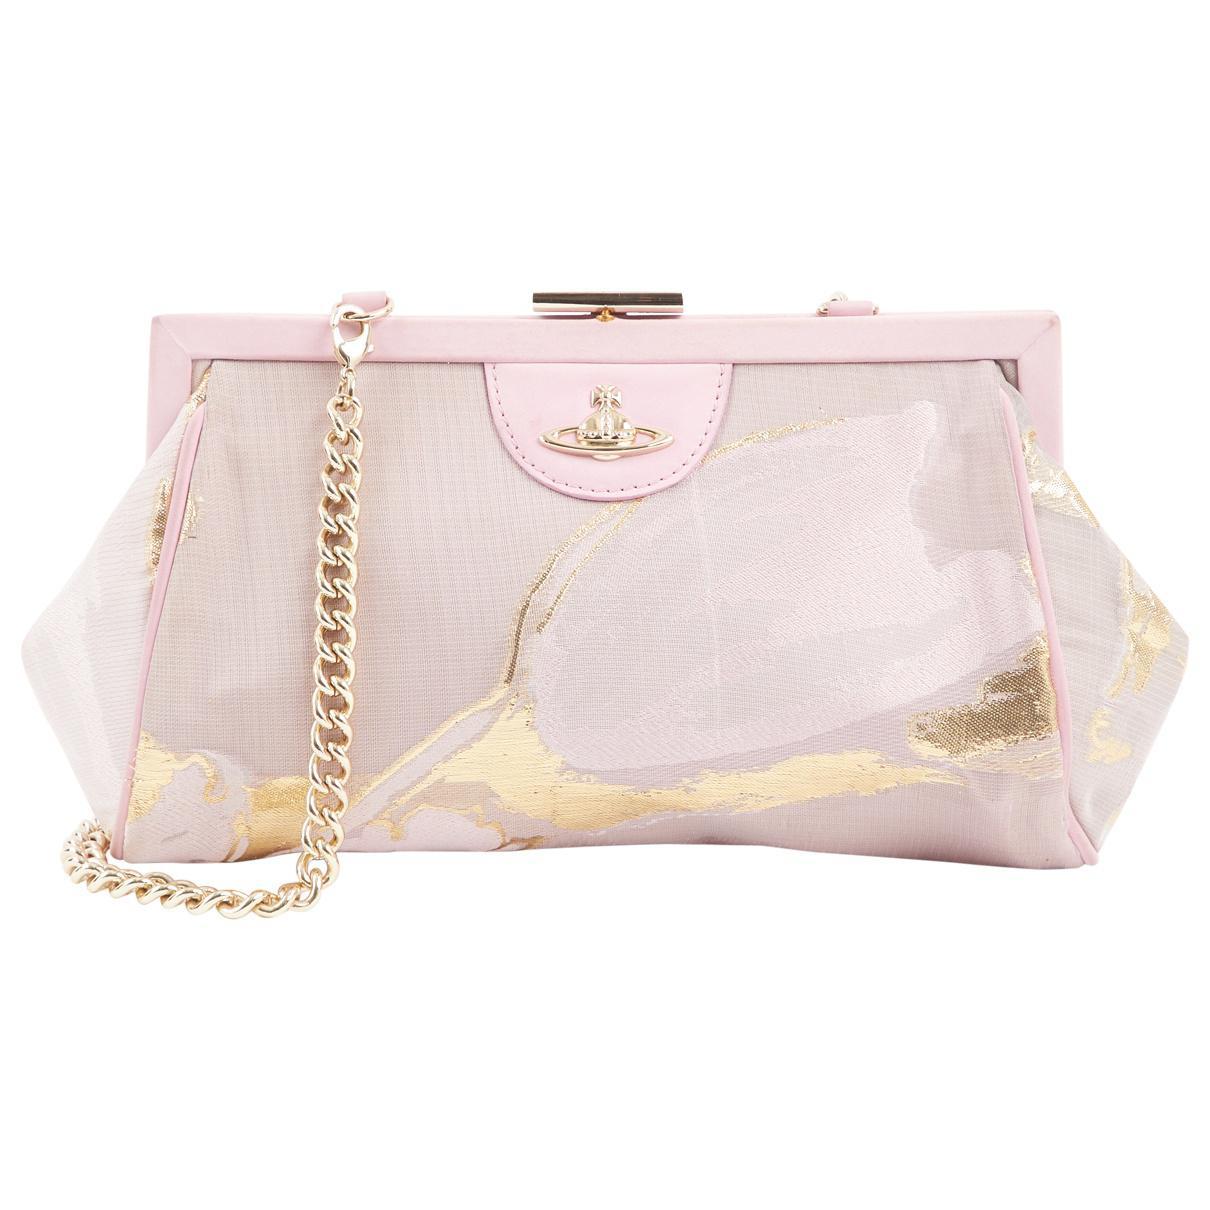 Vivienne Westwood Pre-owned - Cloth mini bag hUFpL4iABk